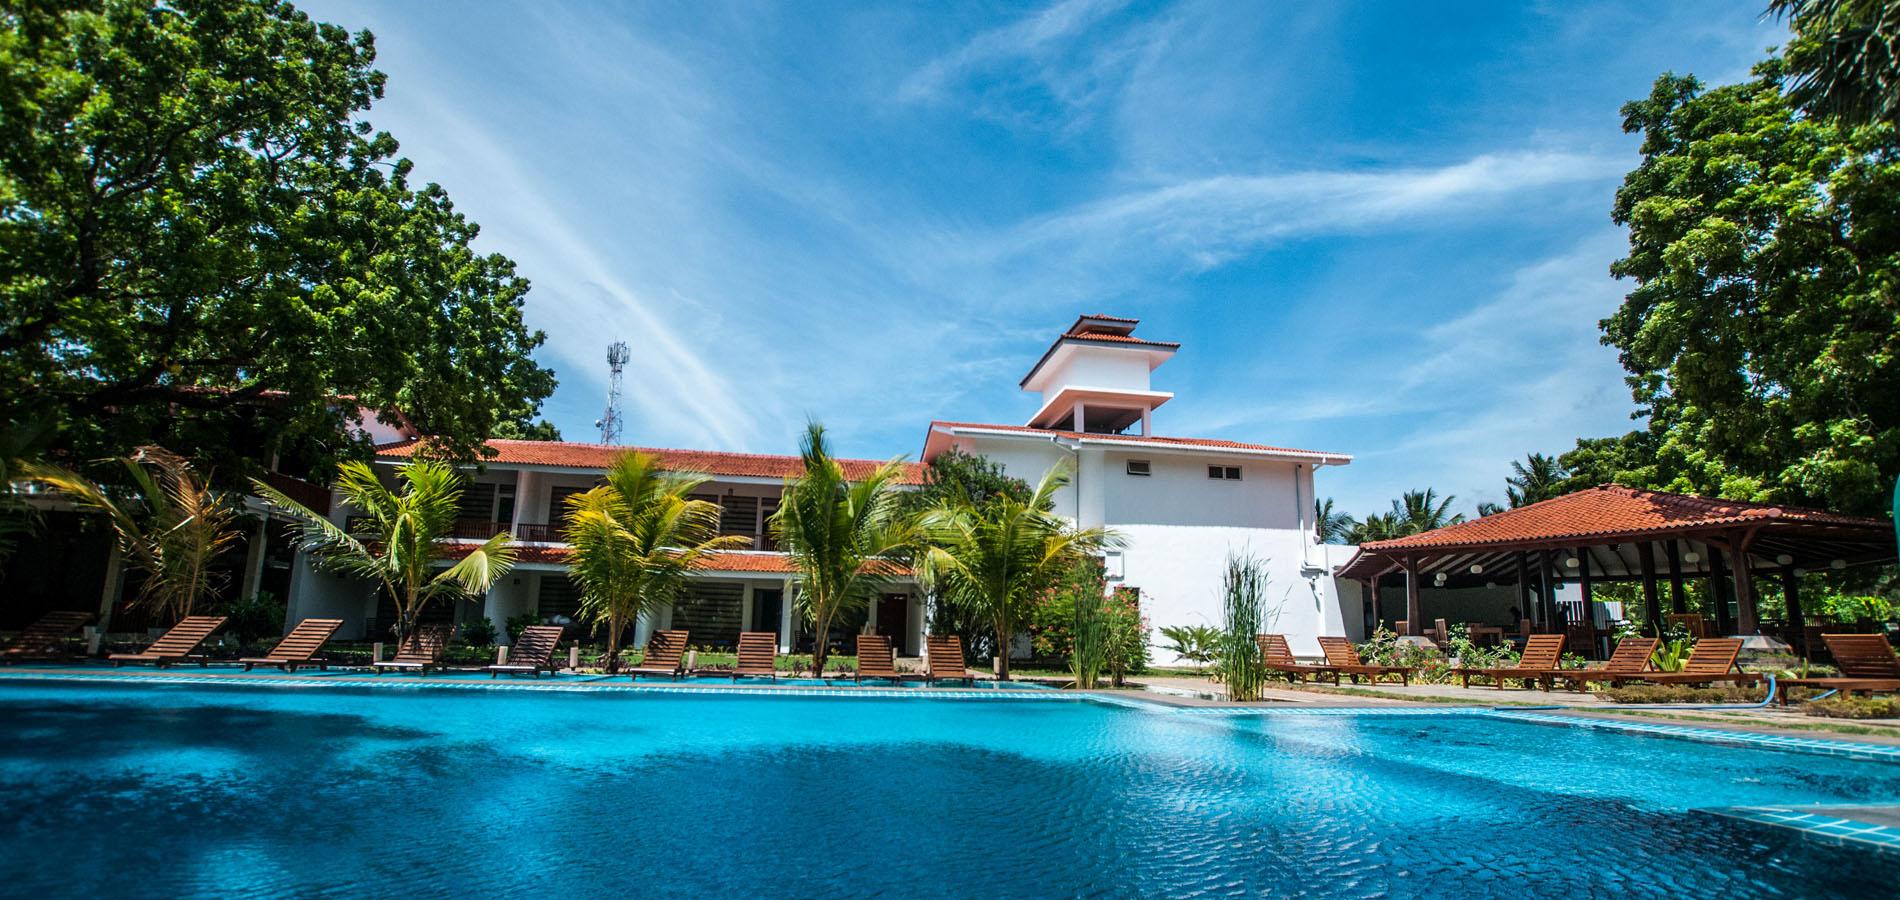 Anantamaa hotel trincomalee original asia for Hotel original